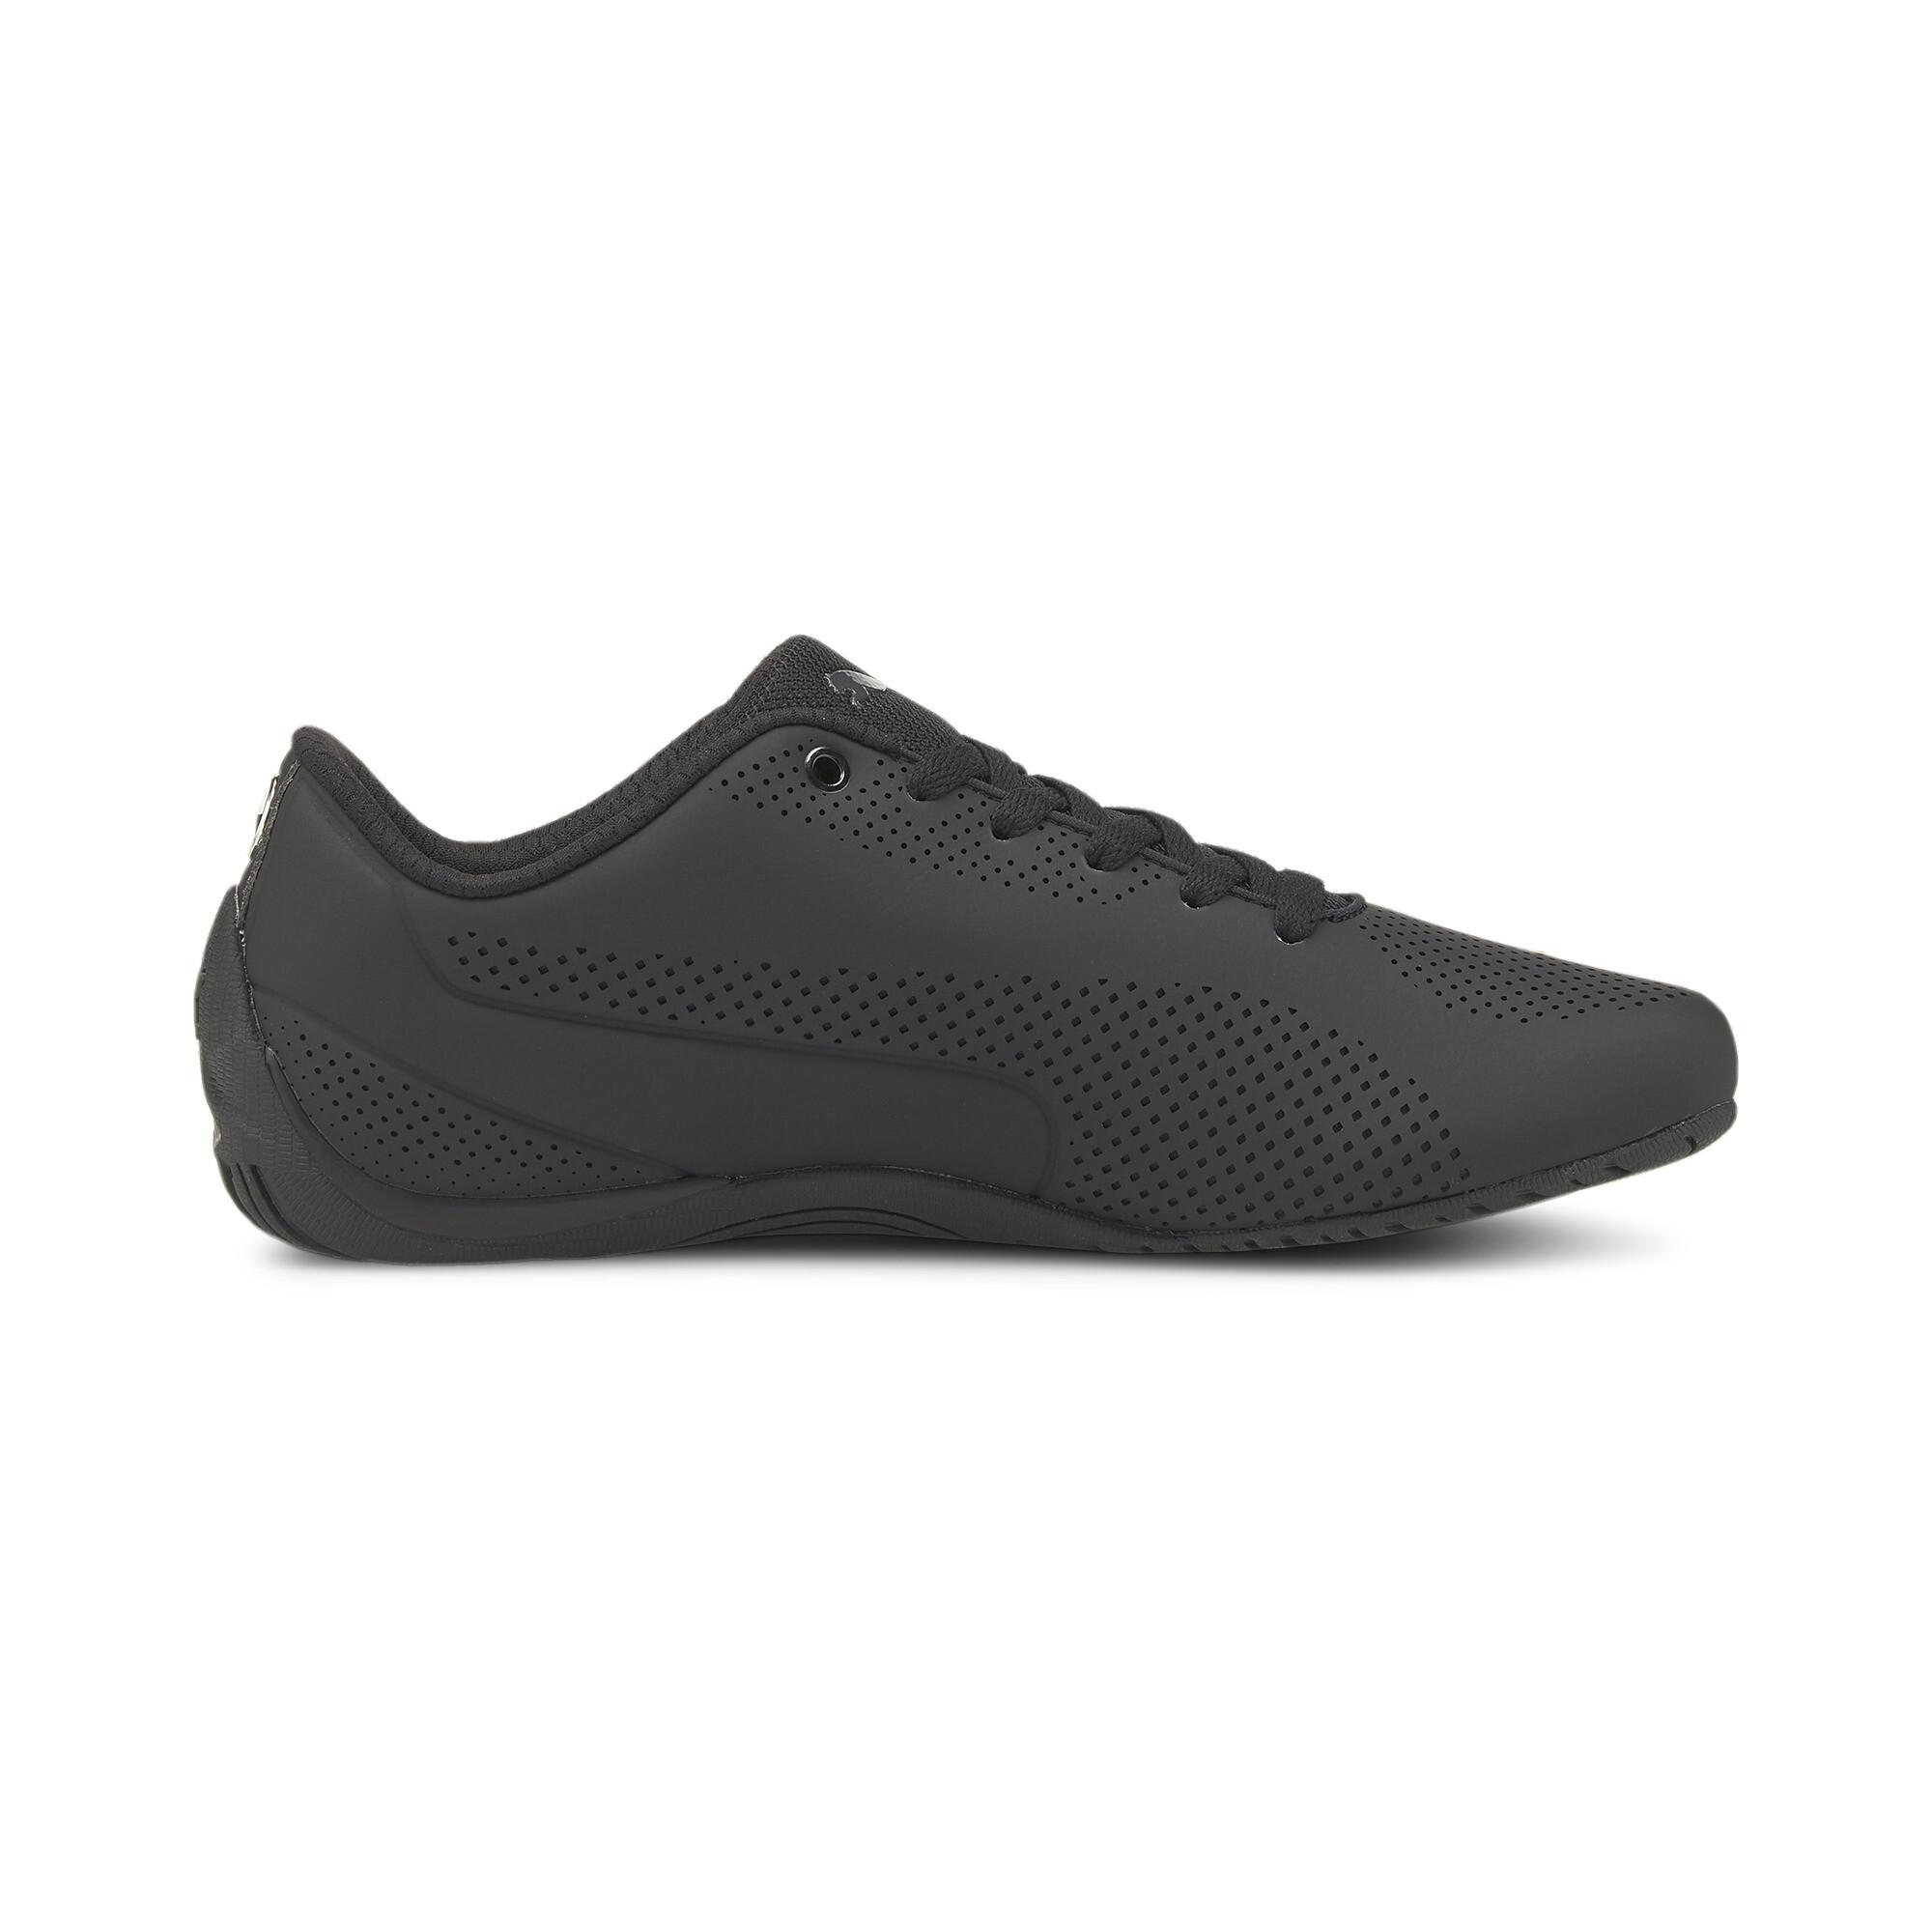 Indexbild 13 - PUMA MERCEDES AMG PETRONAS Drift Cat Ultra Sneaker Unisex Schuhe Neu